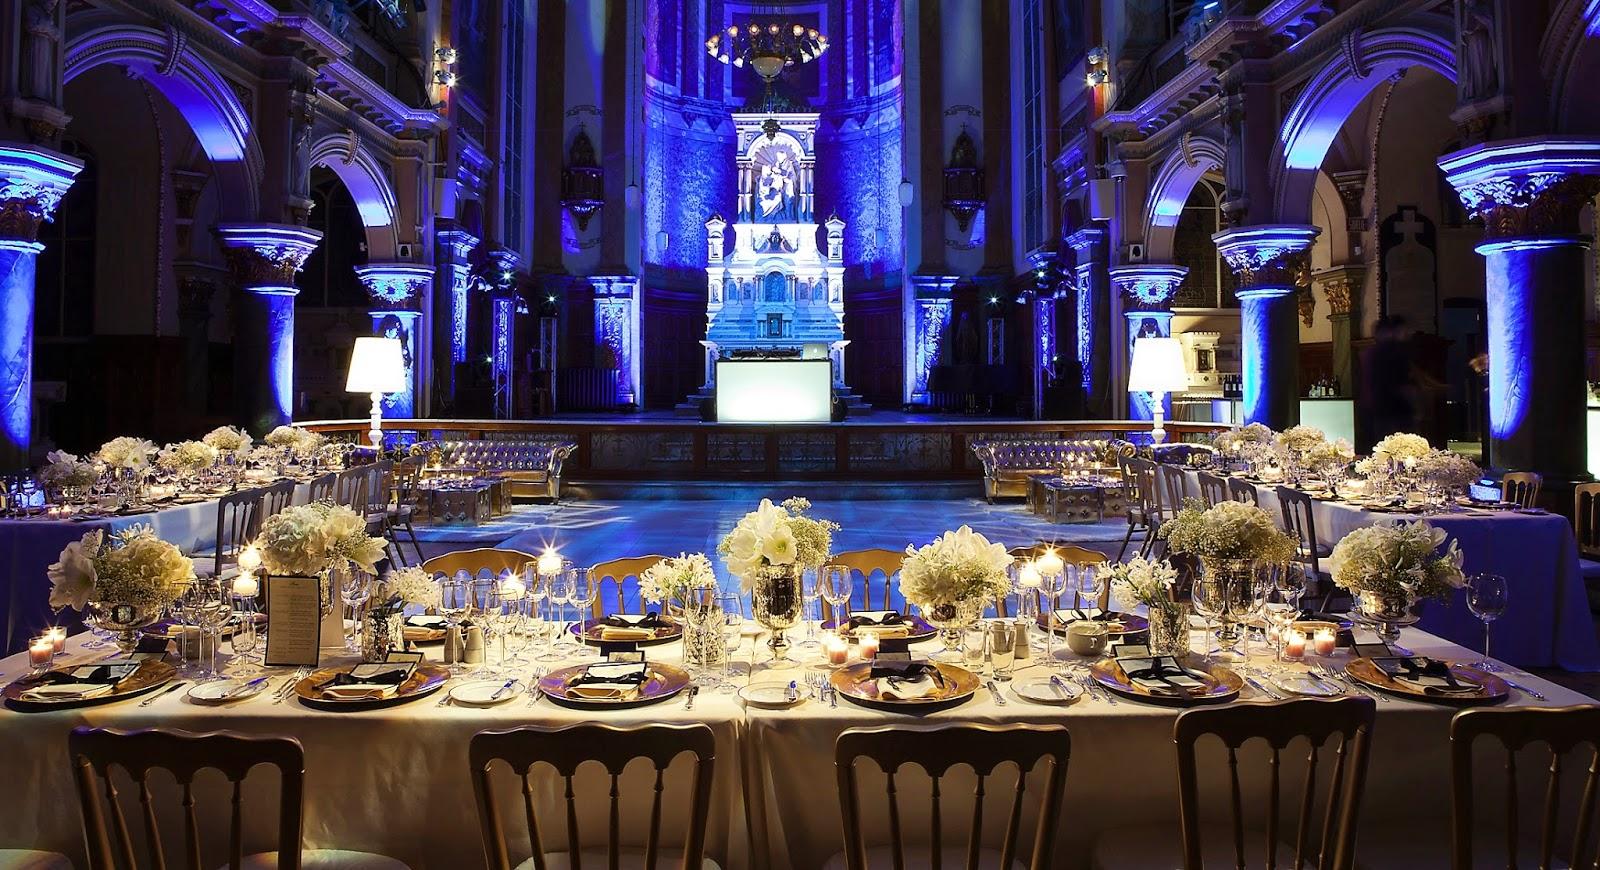 Luxury Wedding Event: Luxury Wedding Themes